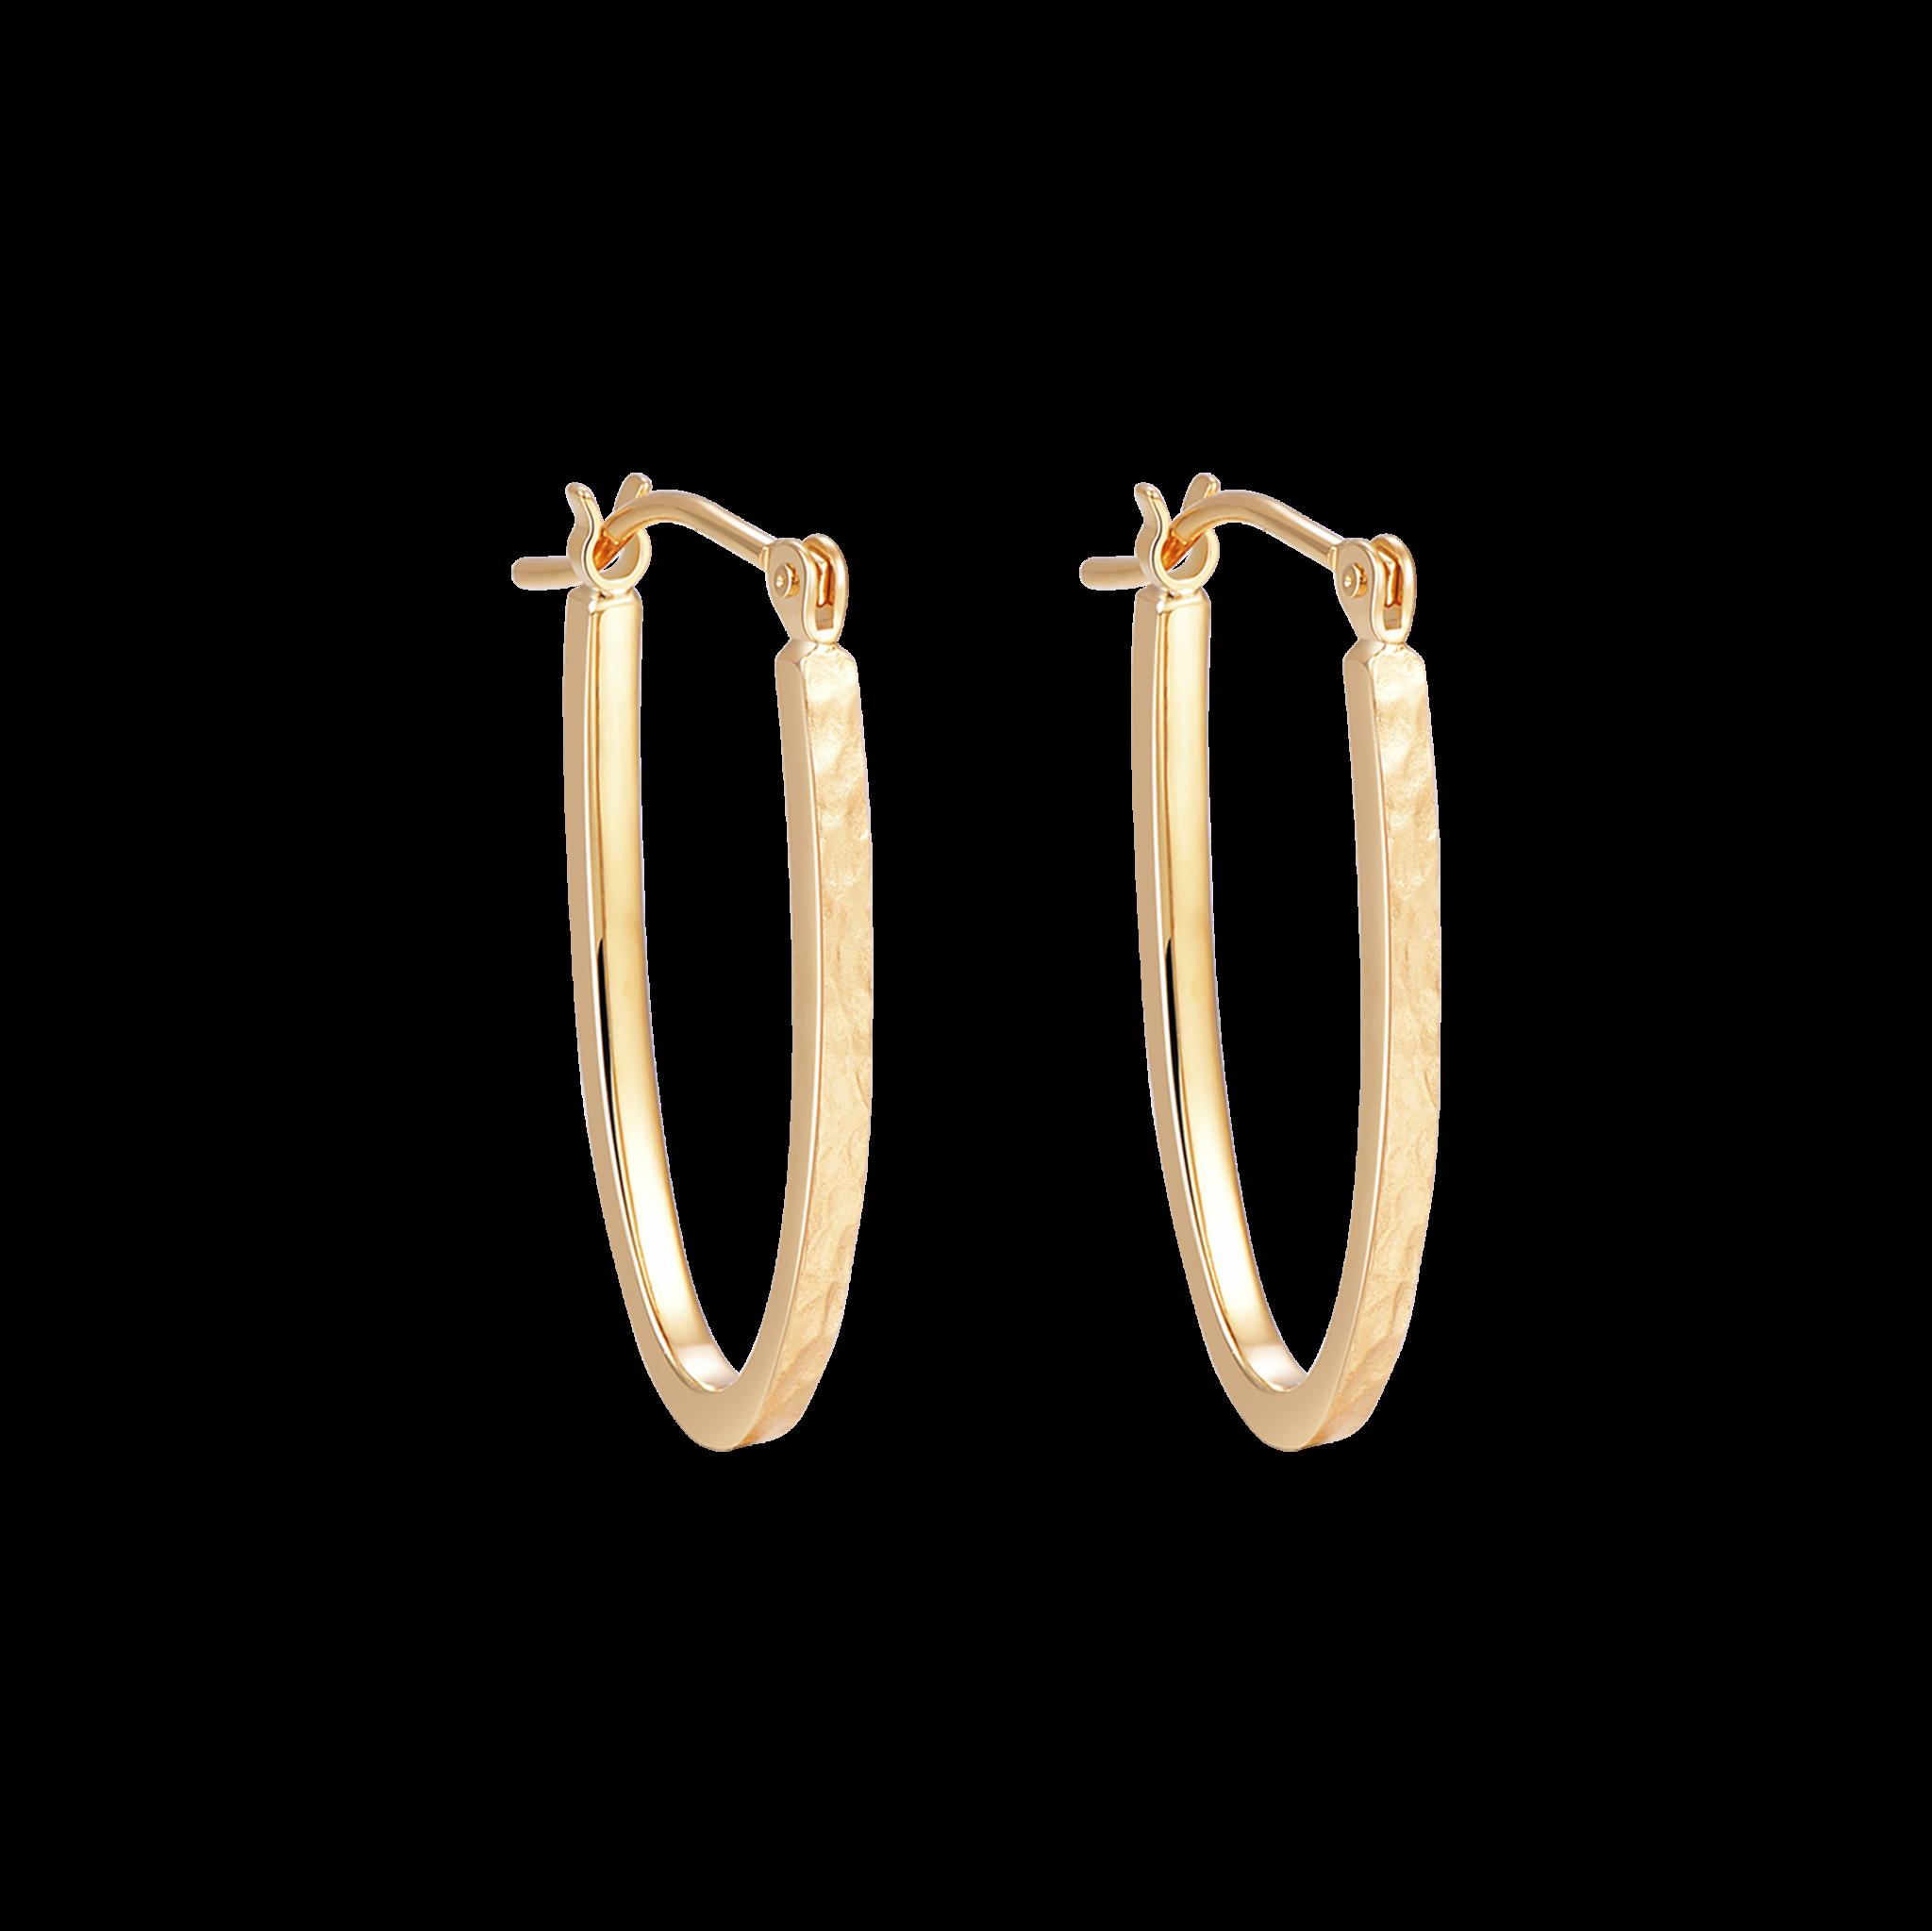 Martelage Collectiob 10K黄金 锤目纹几何耳环 2399